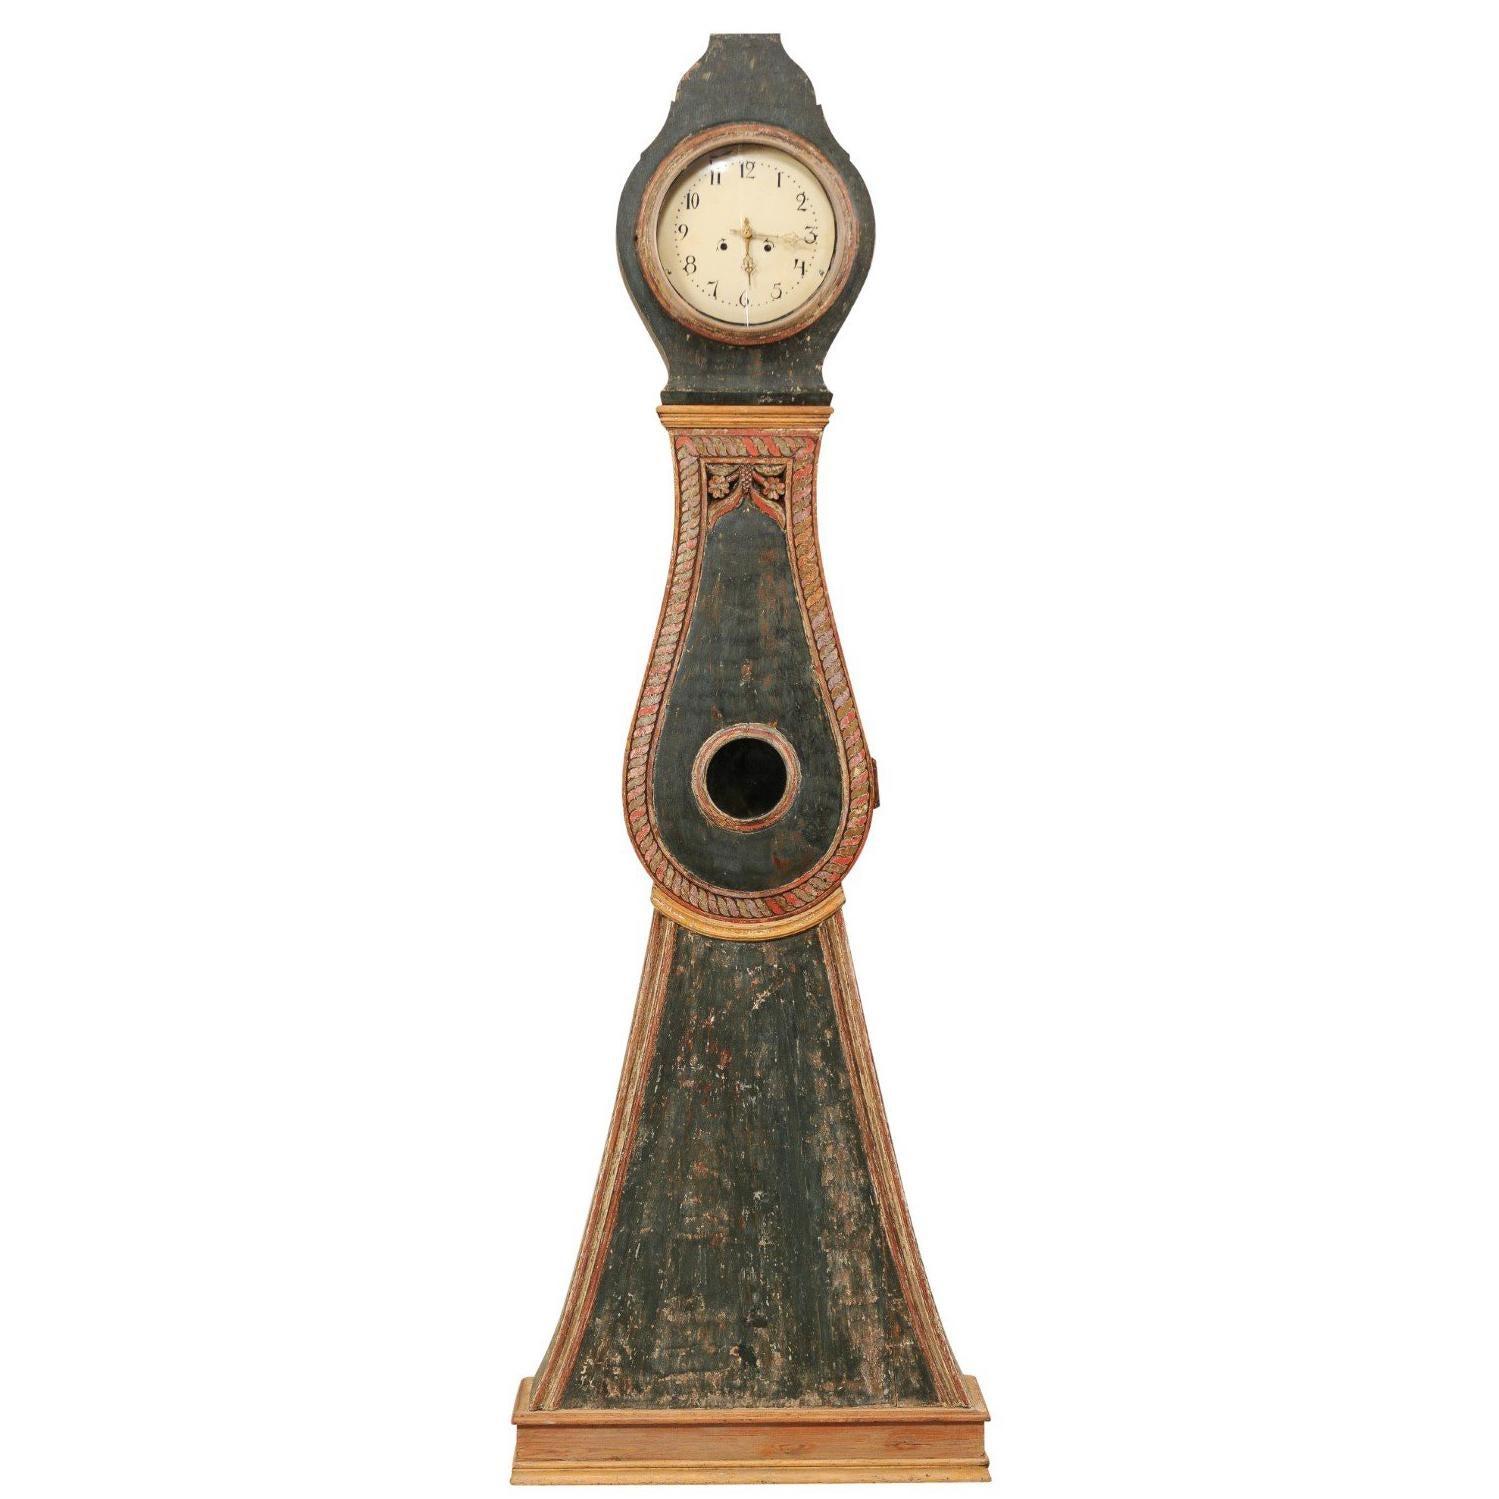 Handsome 19th Century Painted Wood Northern Sweden Floor Clock, circa 1820s